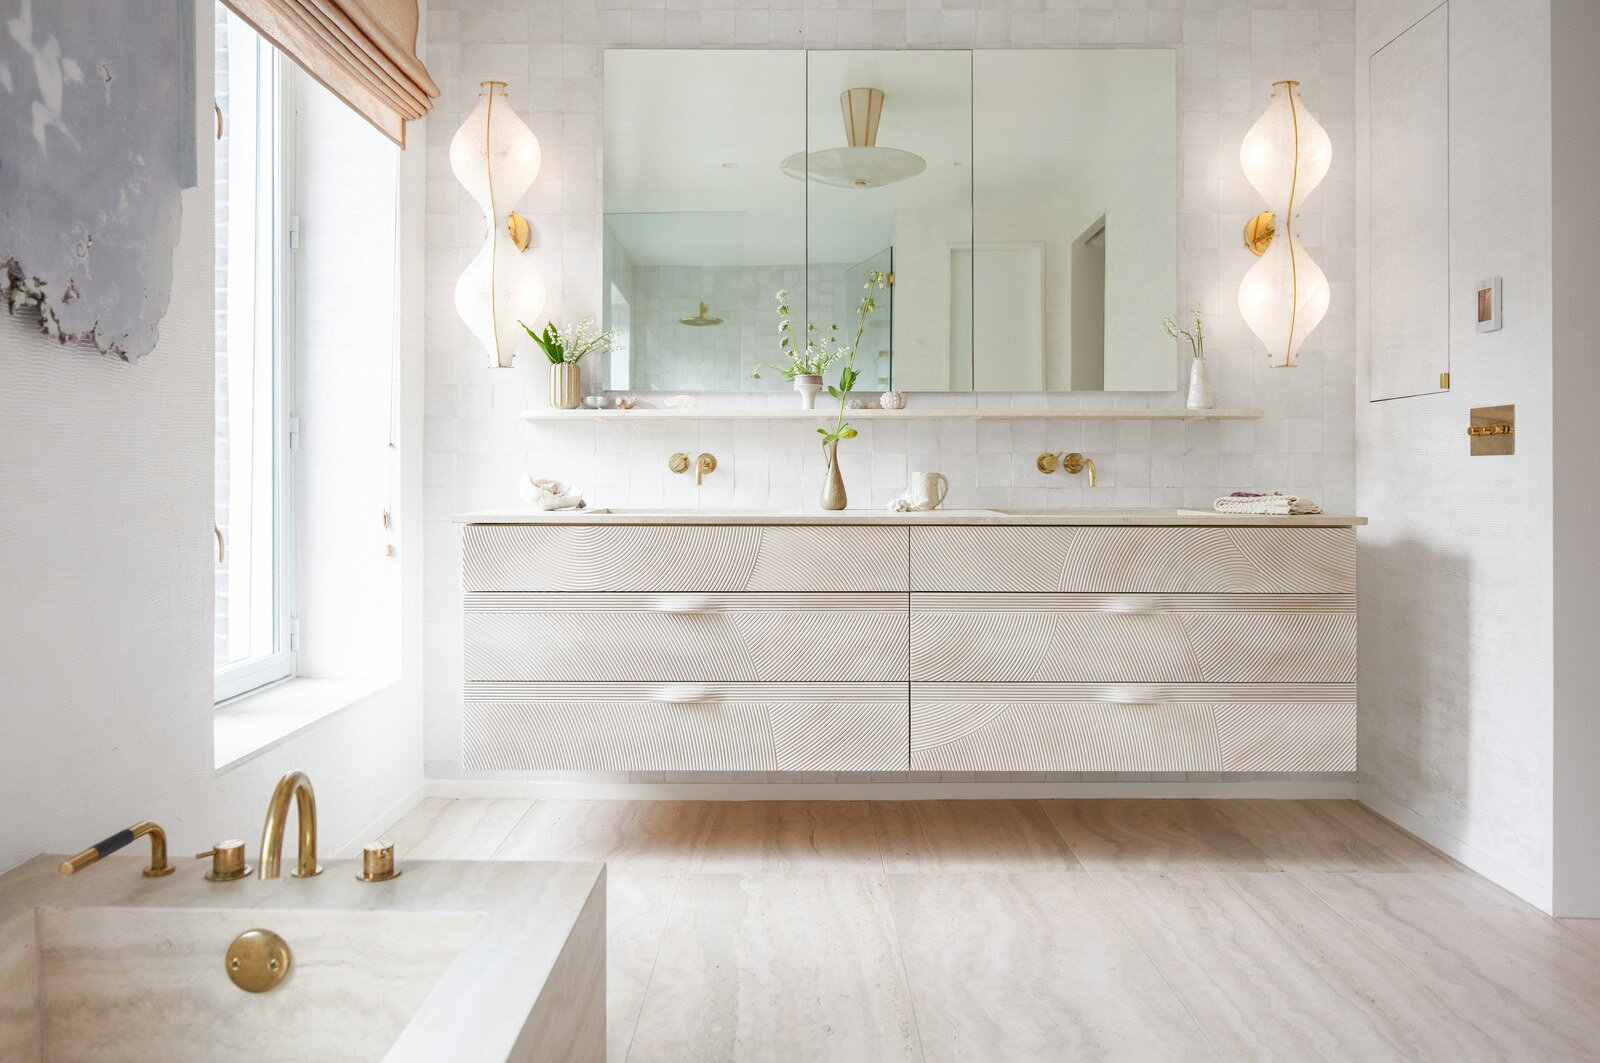 ad uj master bath vanity.jpg